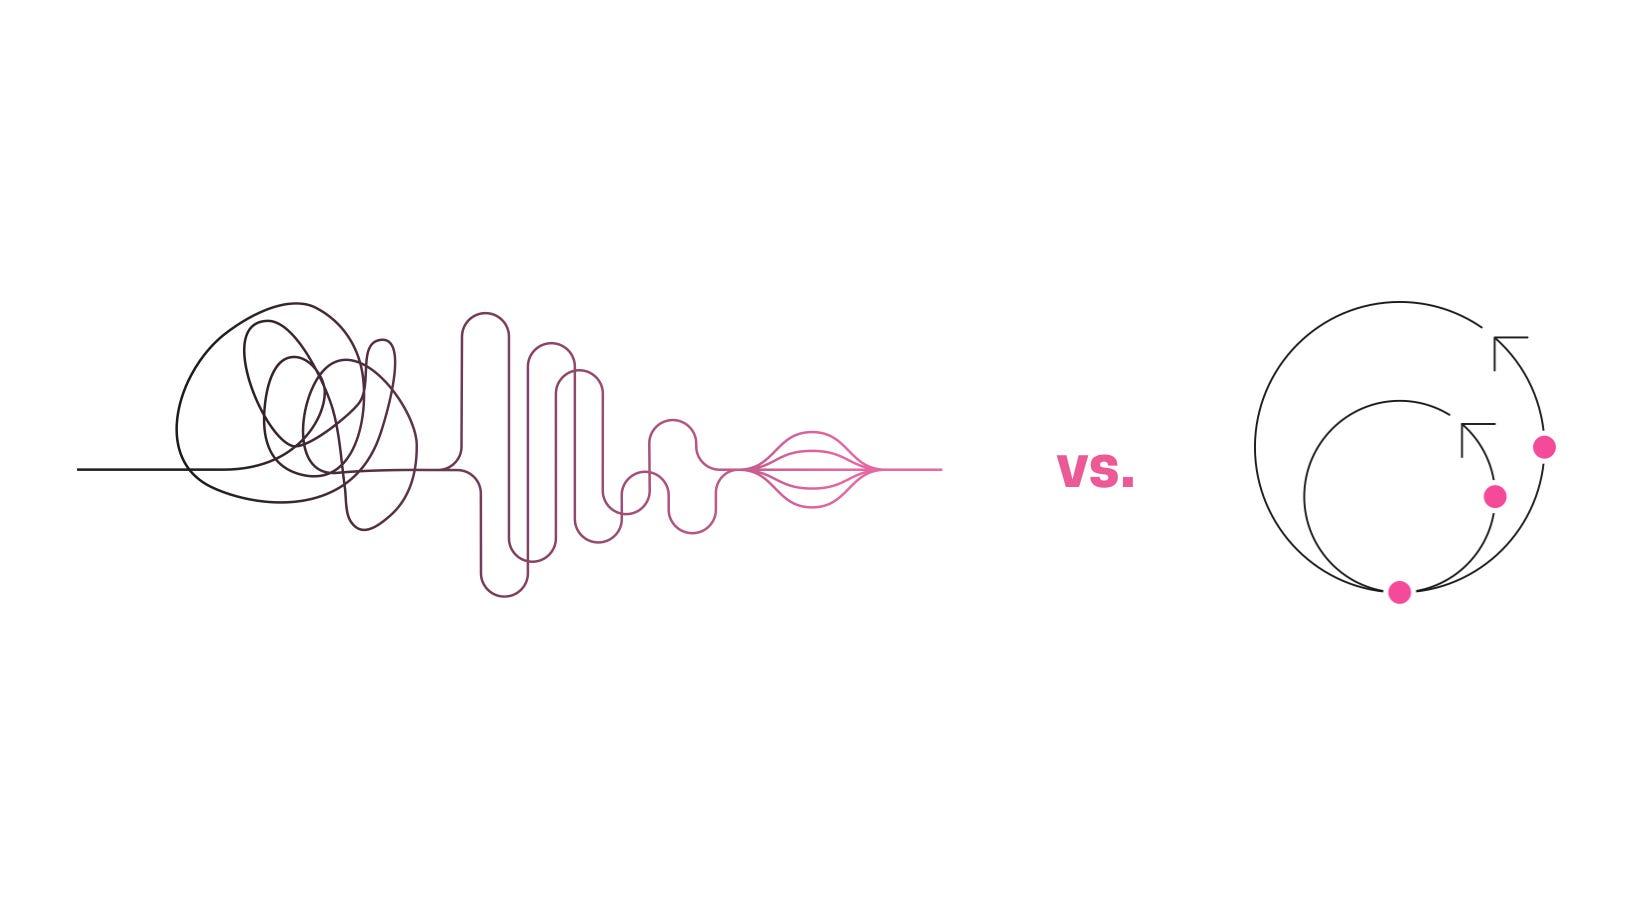 Agile Sprints vs. Design Sprints